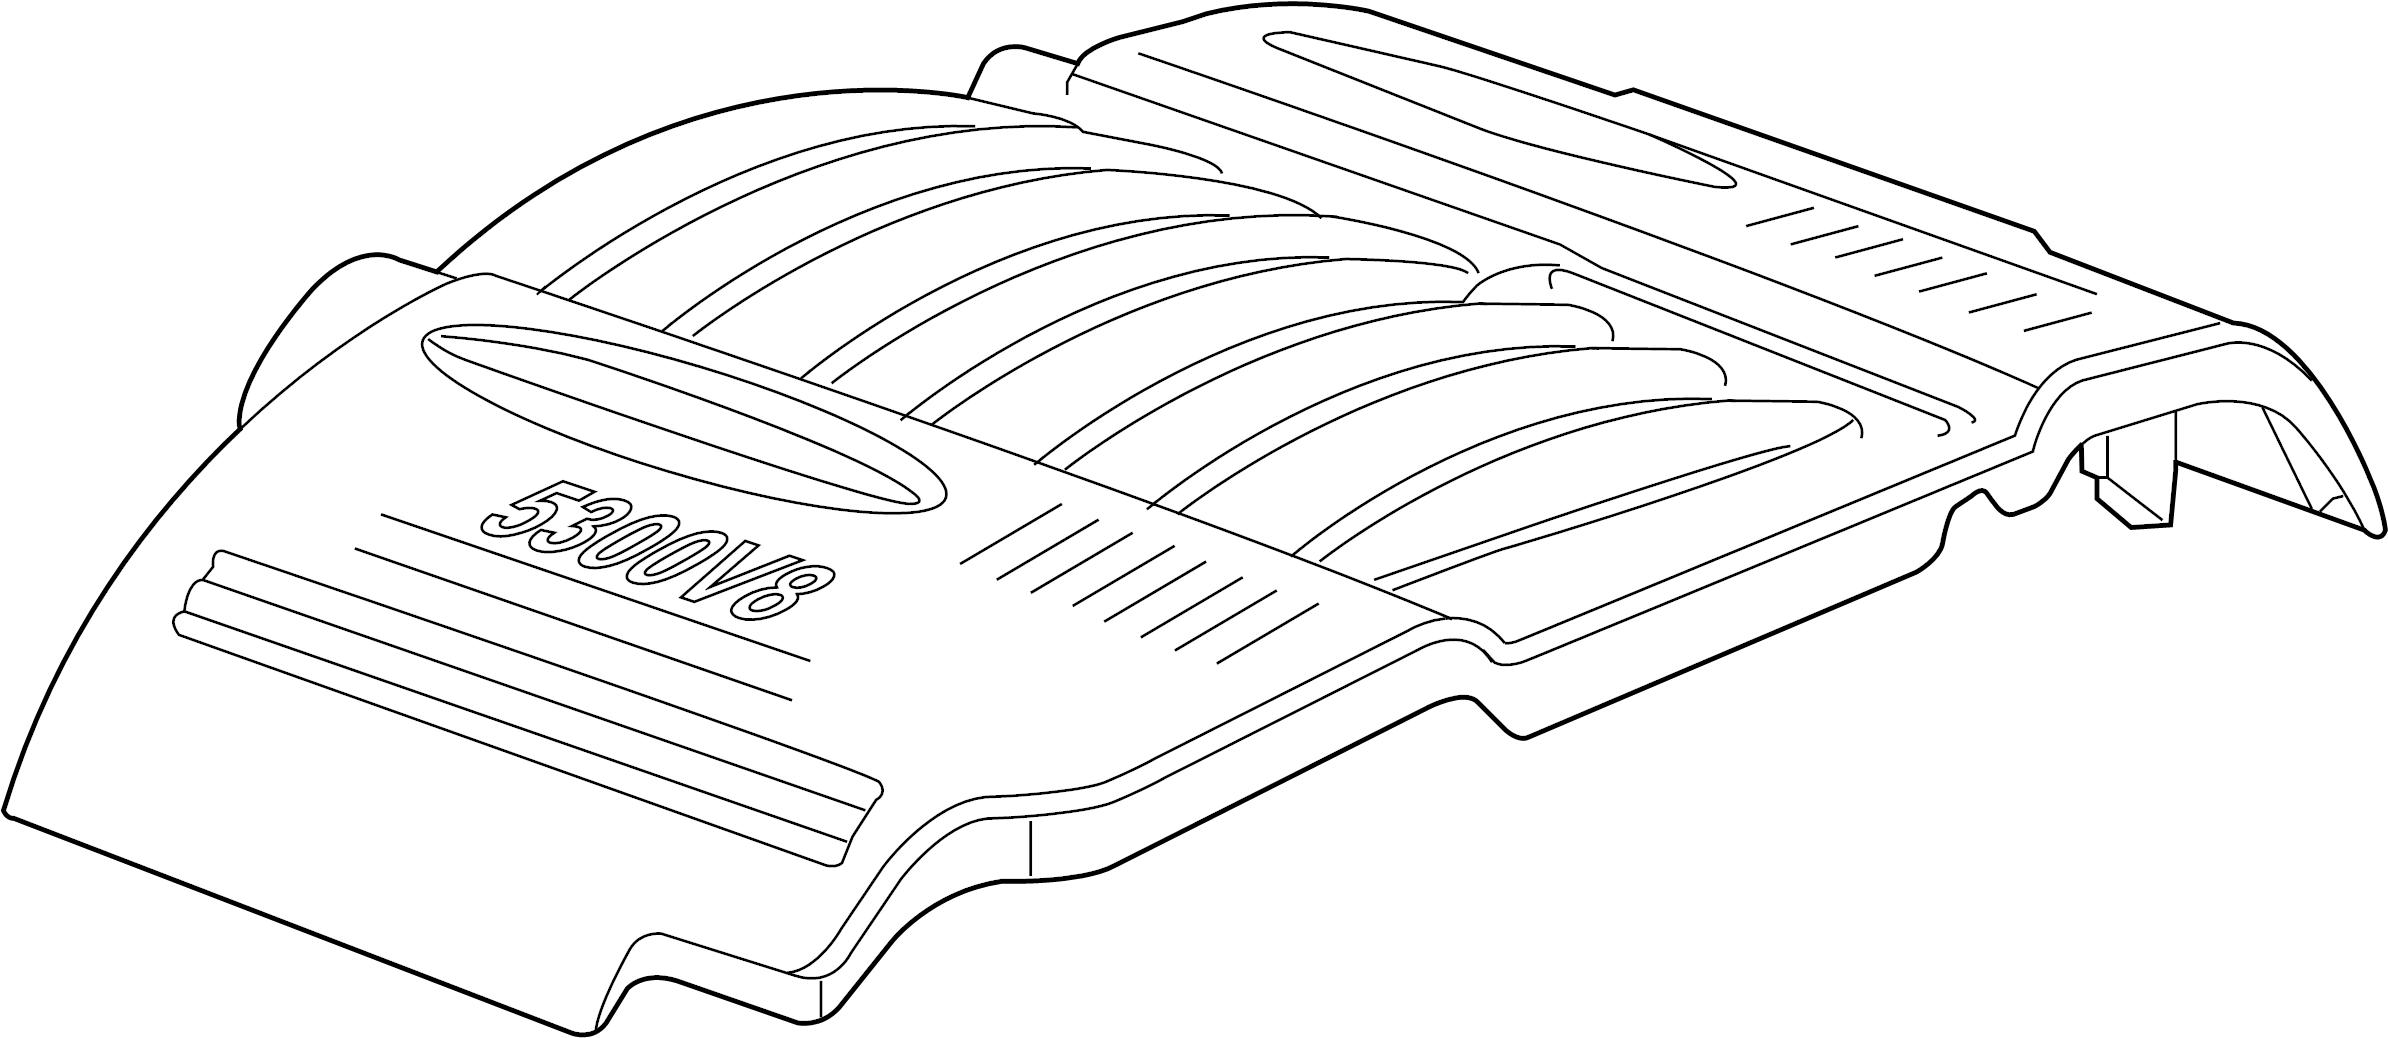 Pontiac Grand Prix Engine Cover 5 3 Liter Transaxle